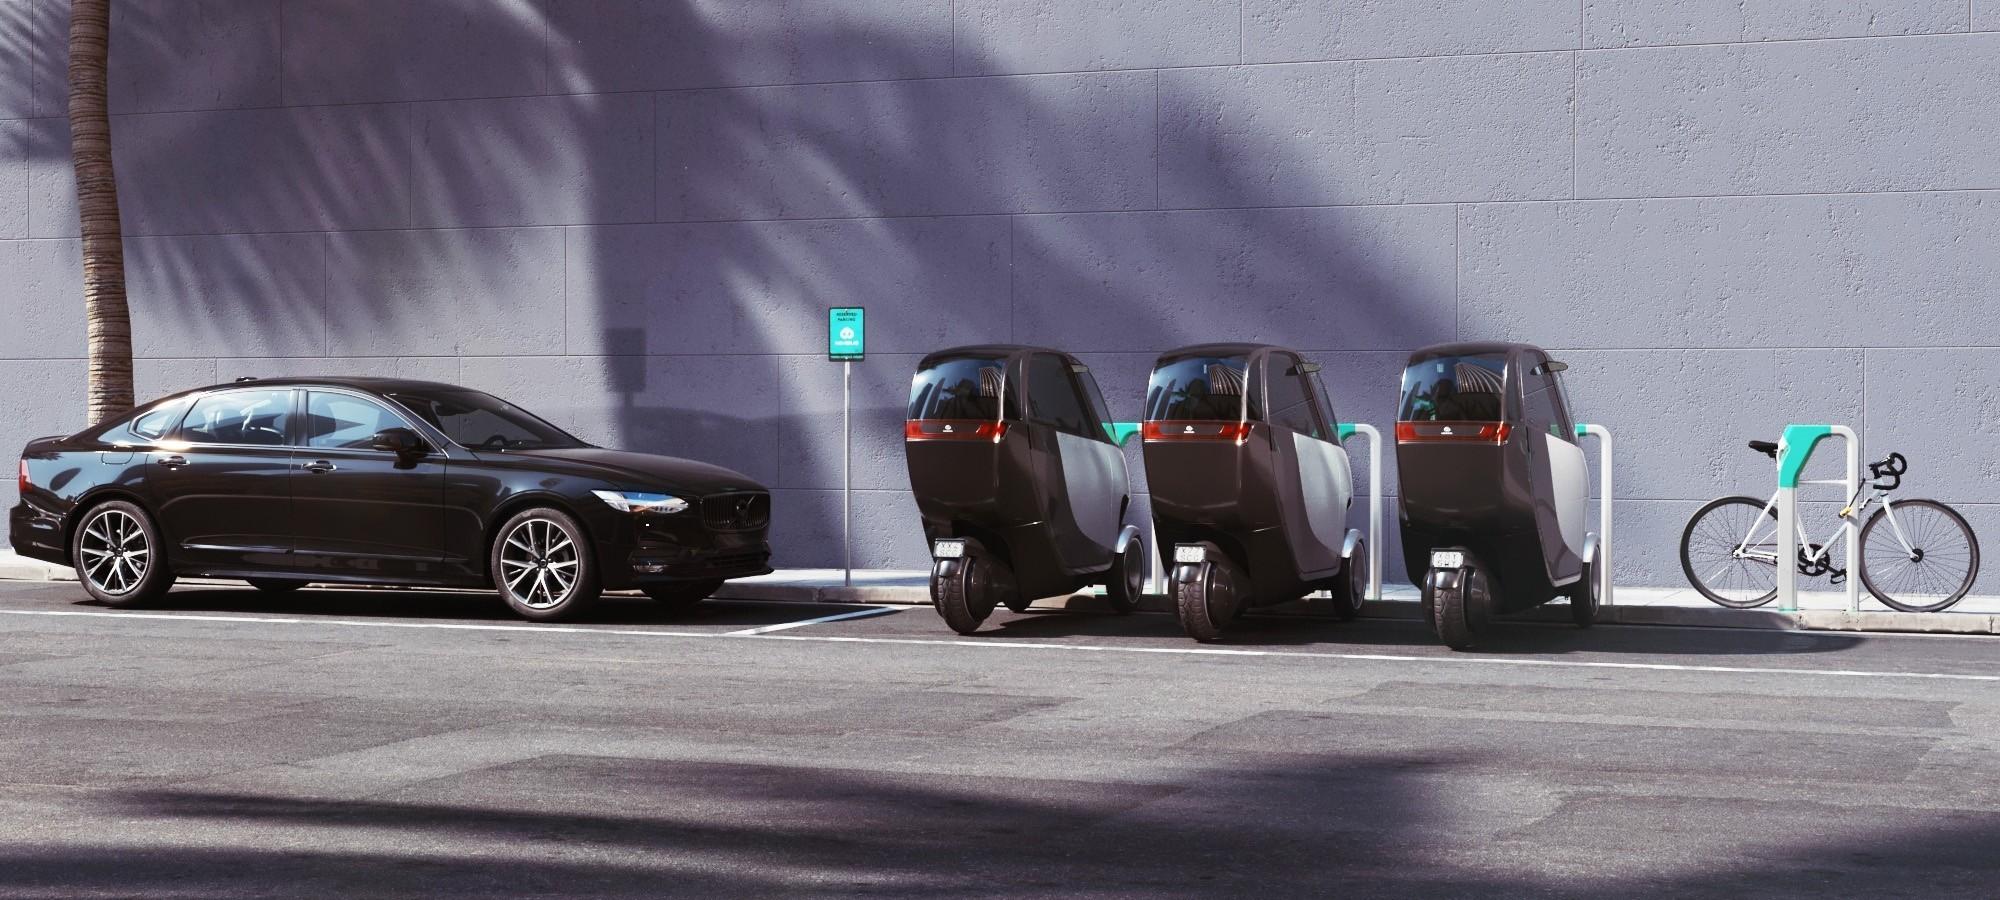 Nimbus Halo: три колеса, три подушки безопасности и два места всего за 6420 долларов